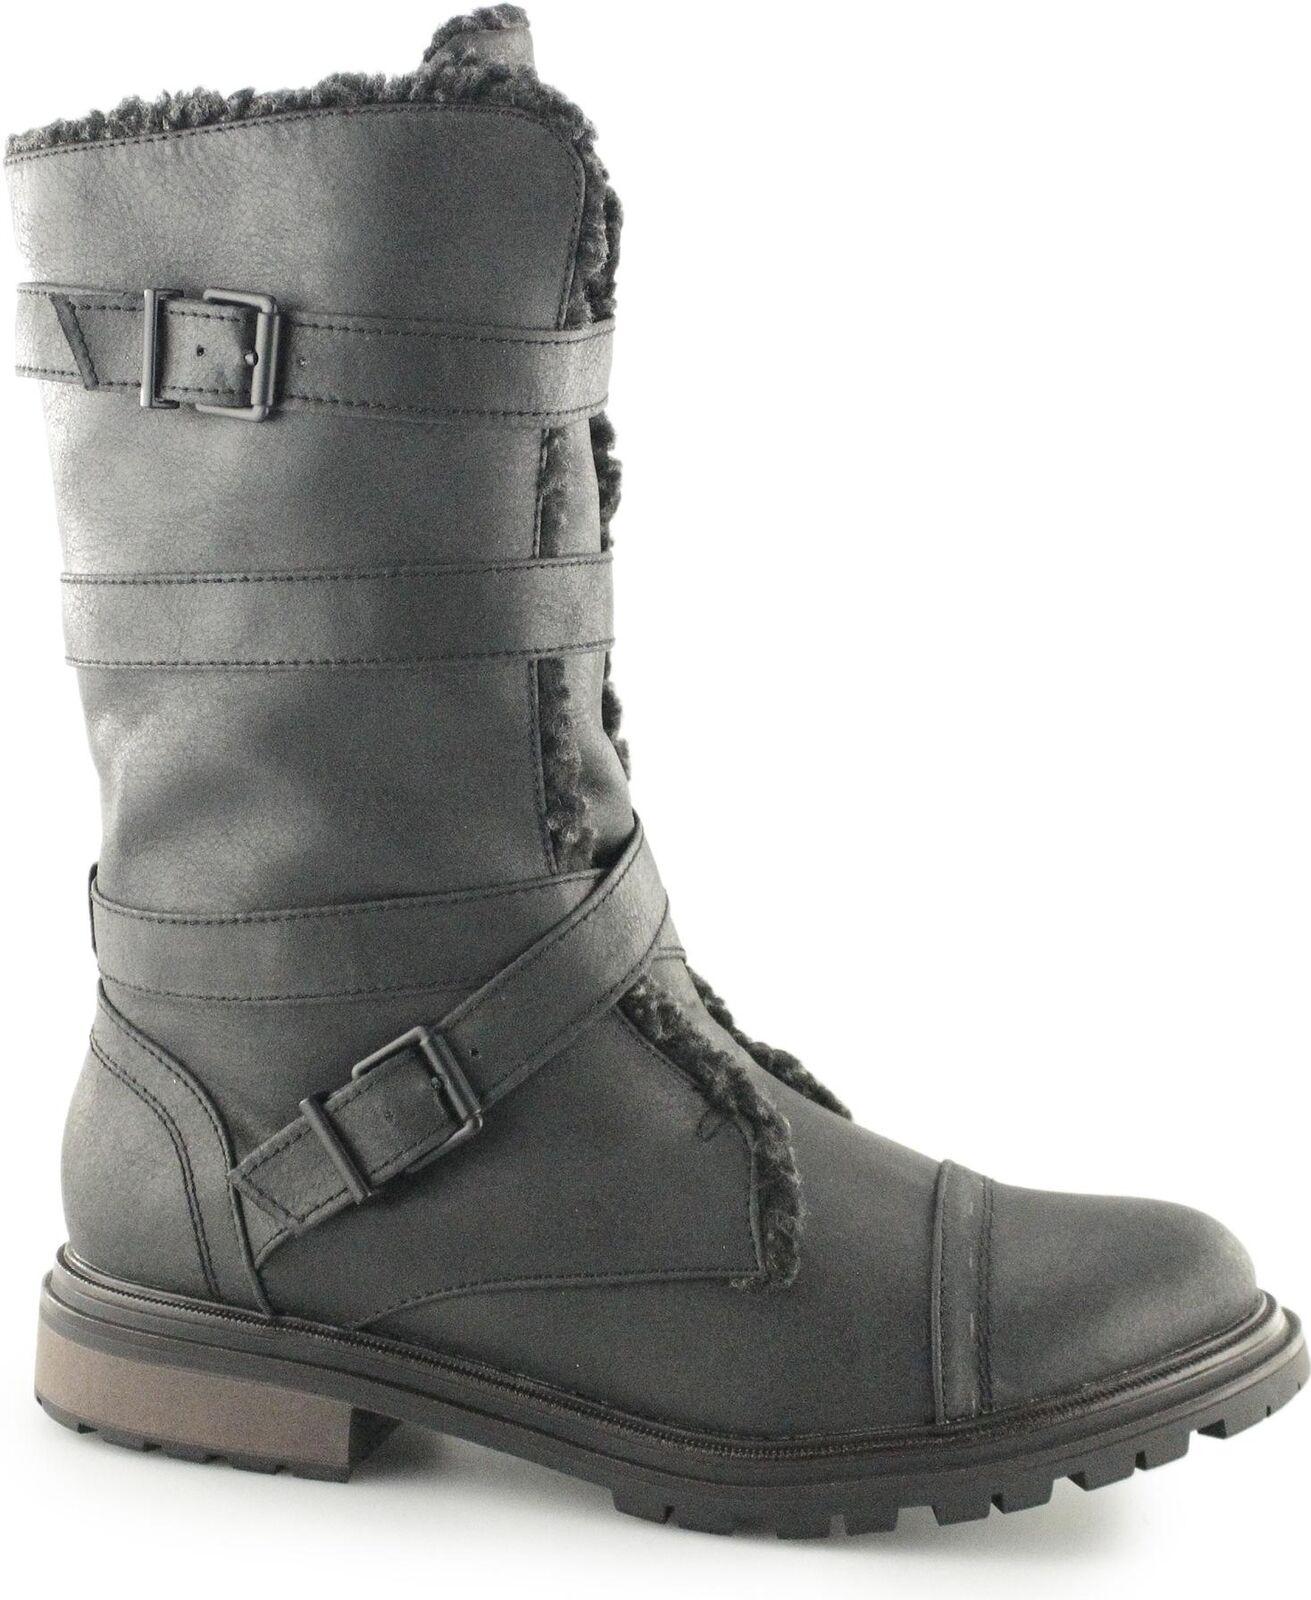 Rocket Dog LANCE Ladies Womens Zip Buckle Up Casual Warm Lined Biker Boots Black